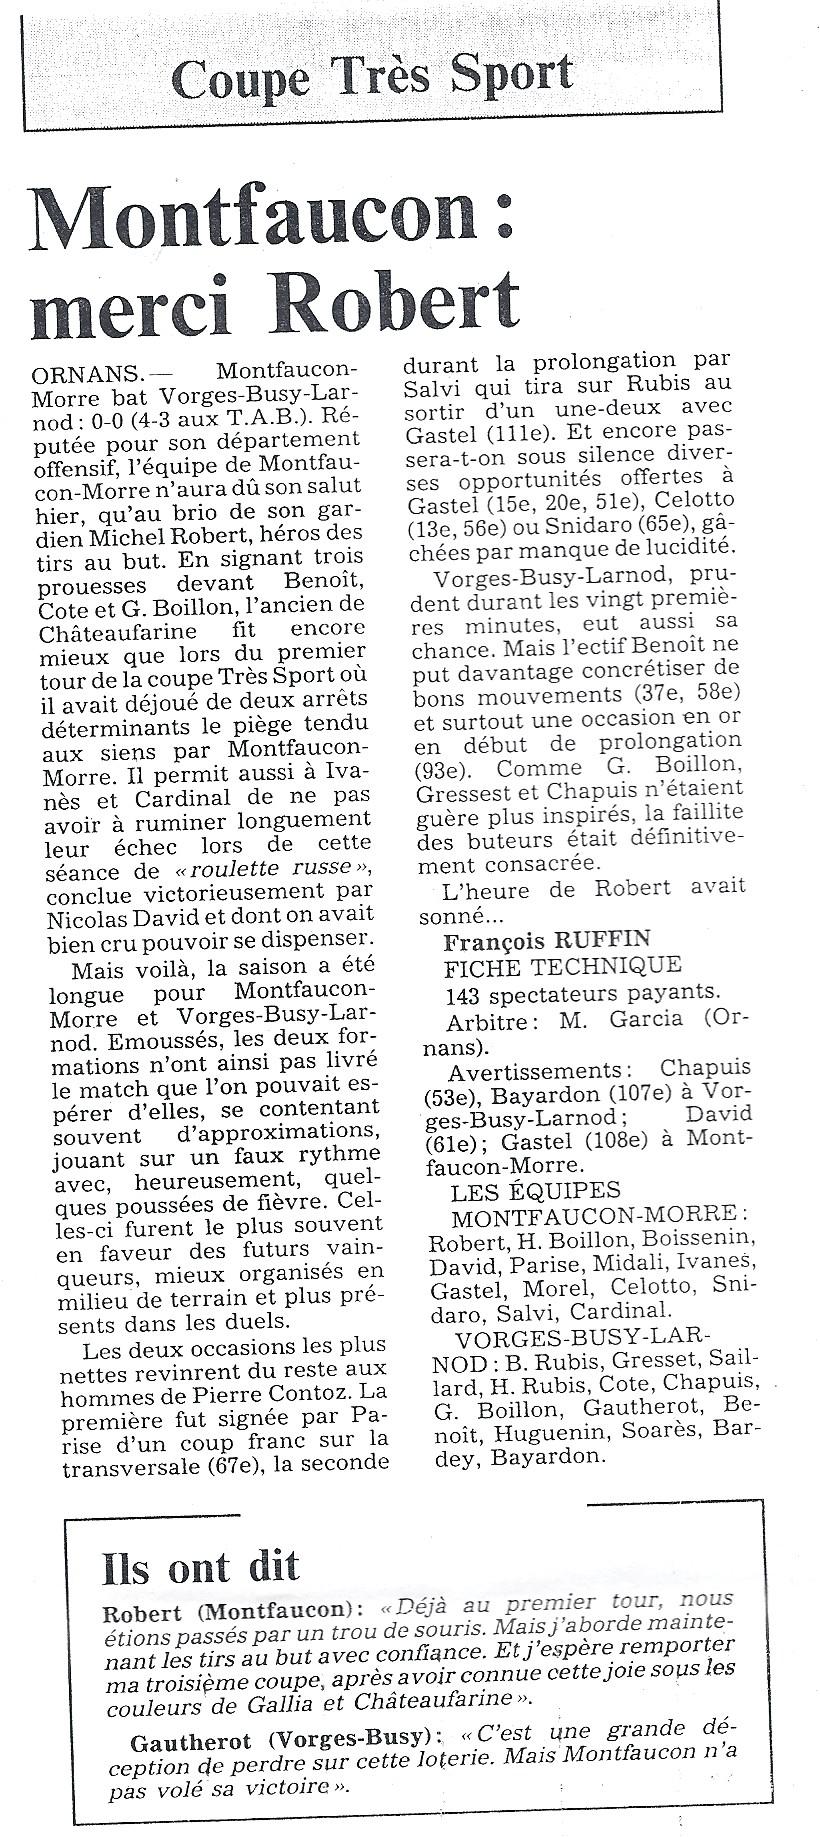 06/1991 - Coupe Très Sport - Merci ROBERT